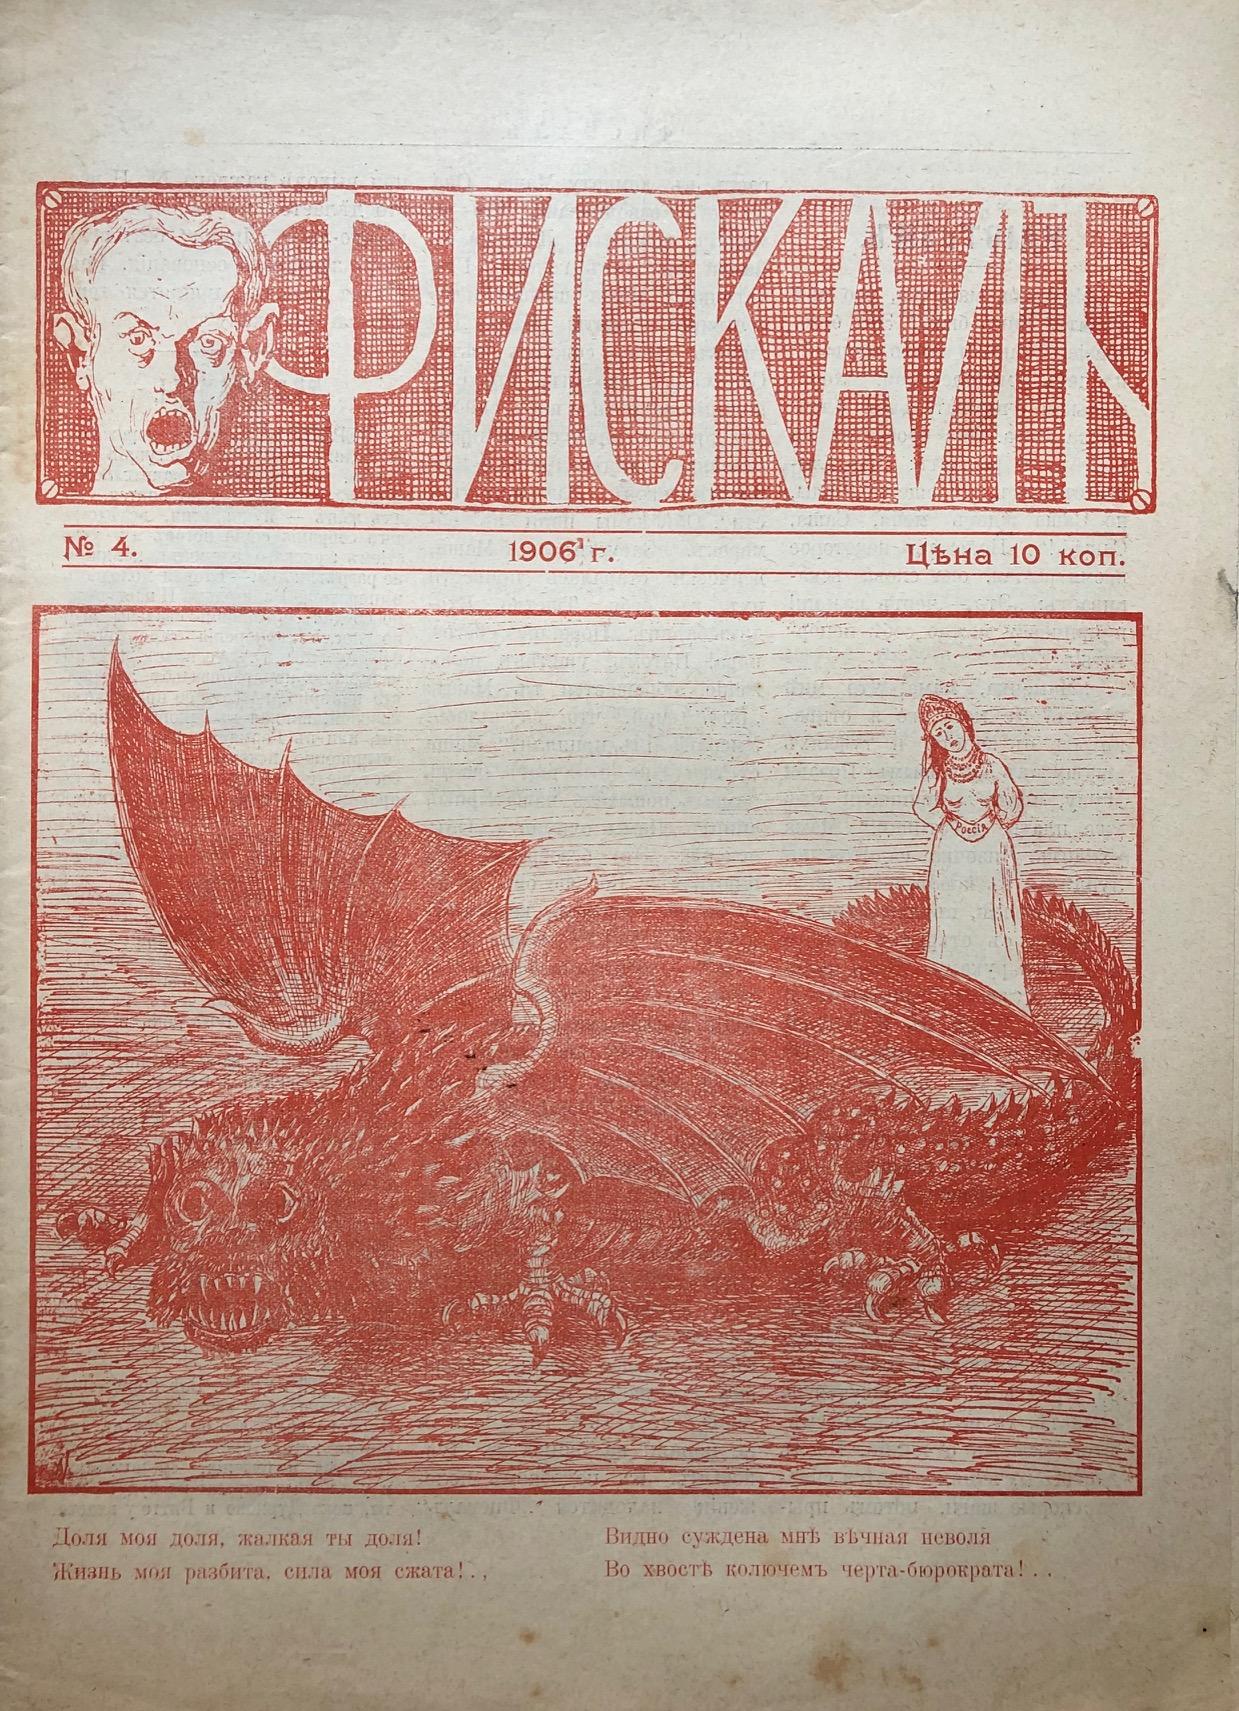 Lot 510 - Le cafardeur. Фискал. Еженедельный журнал. 1906 г., №№ [...]